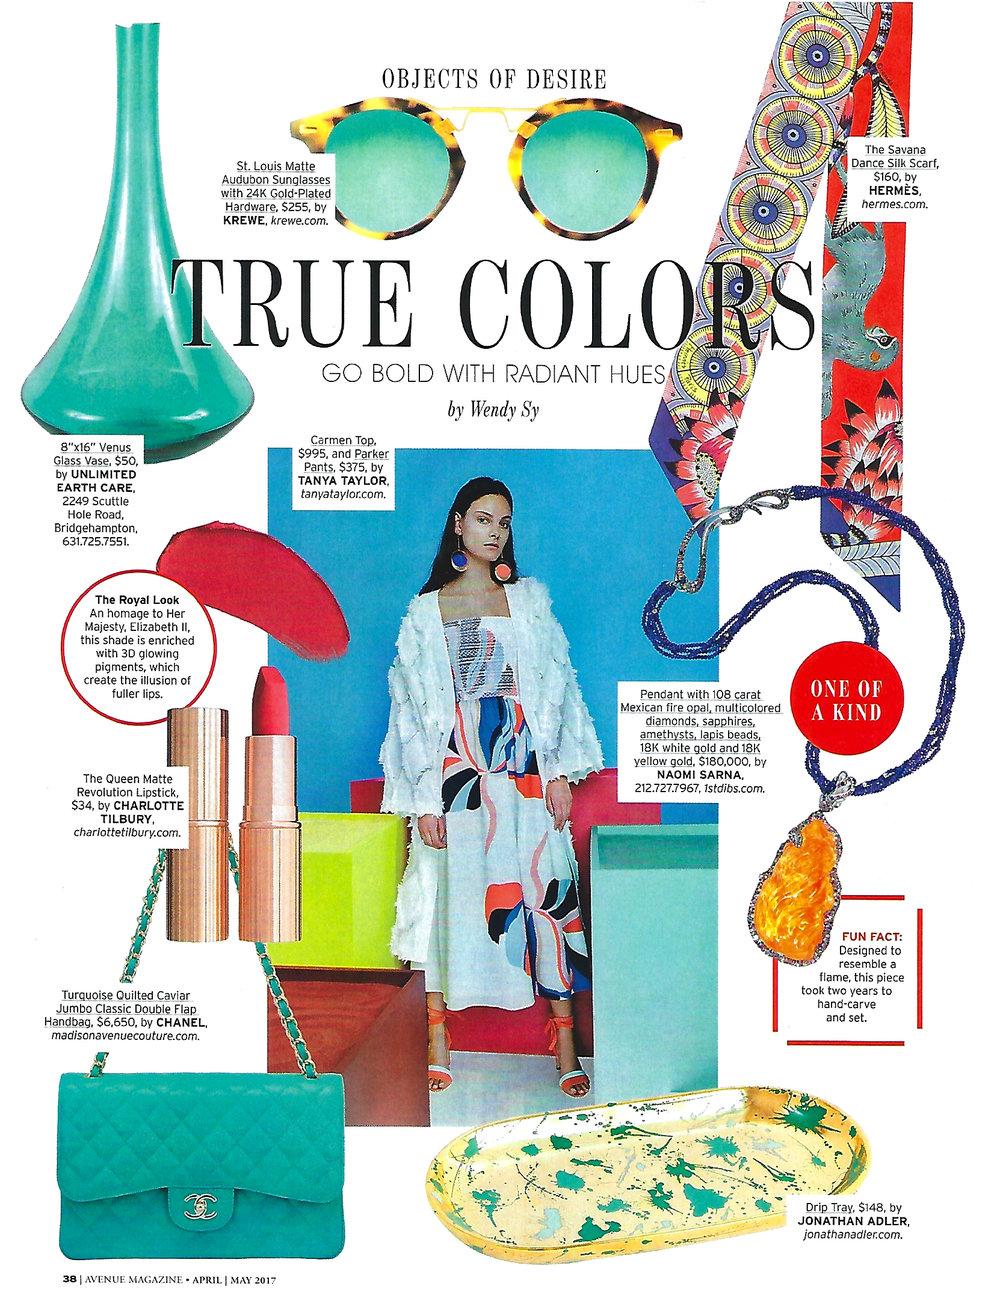 Avenue Magazine - True Colors_May 2017.jpg